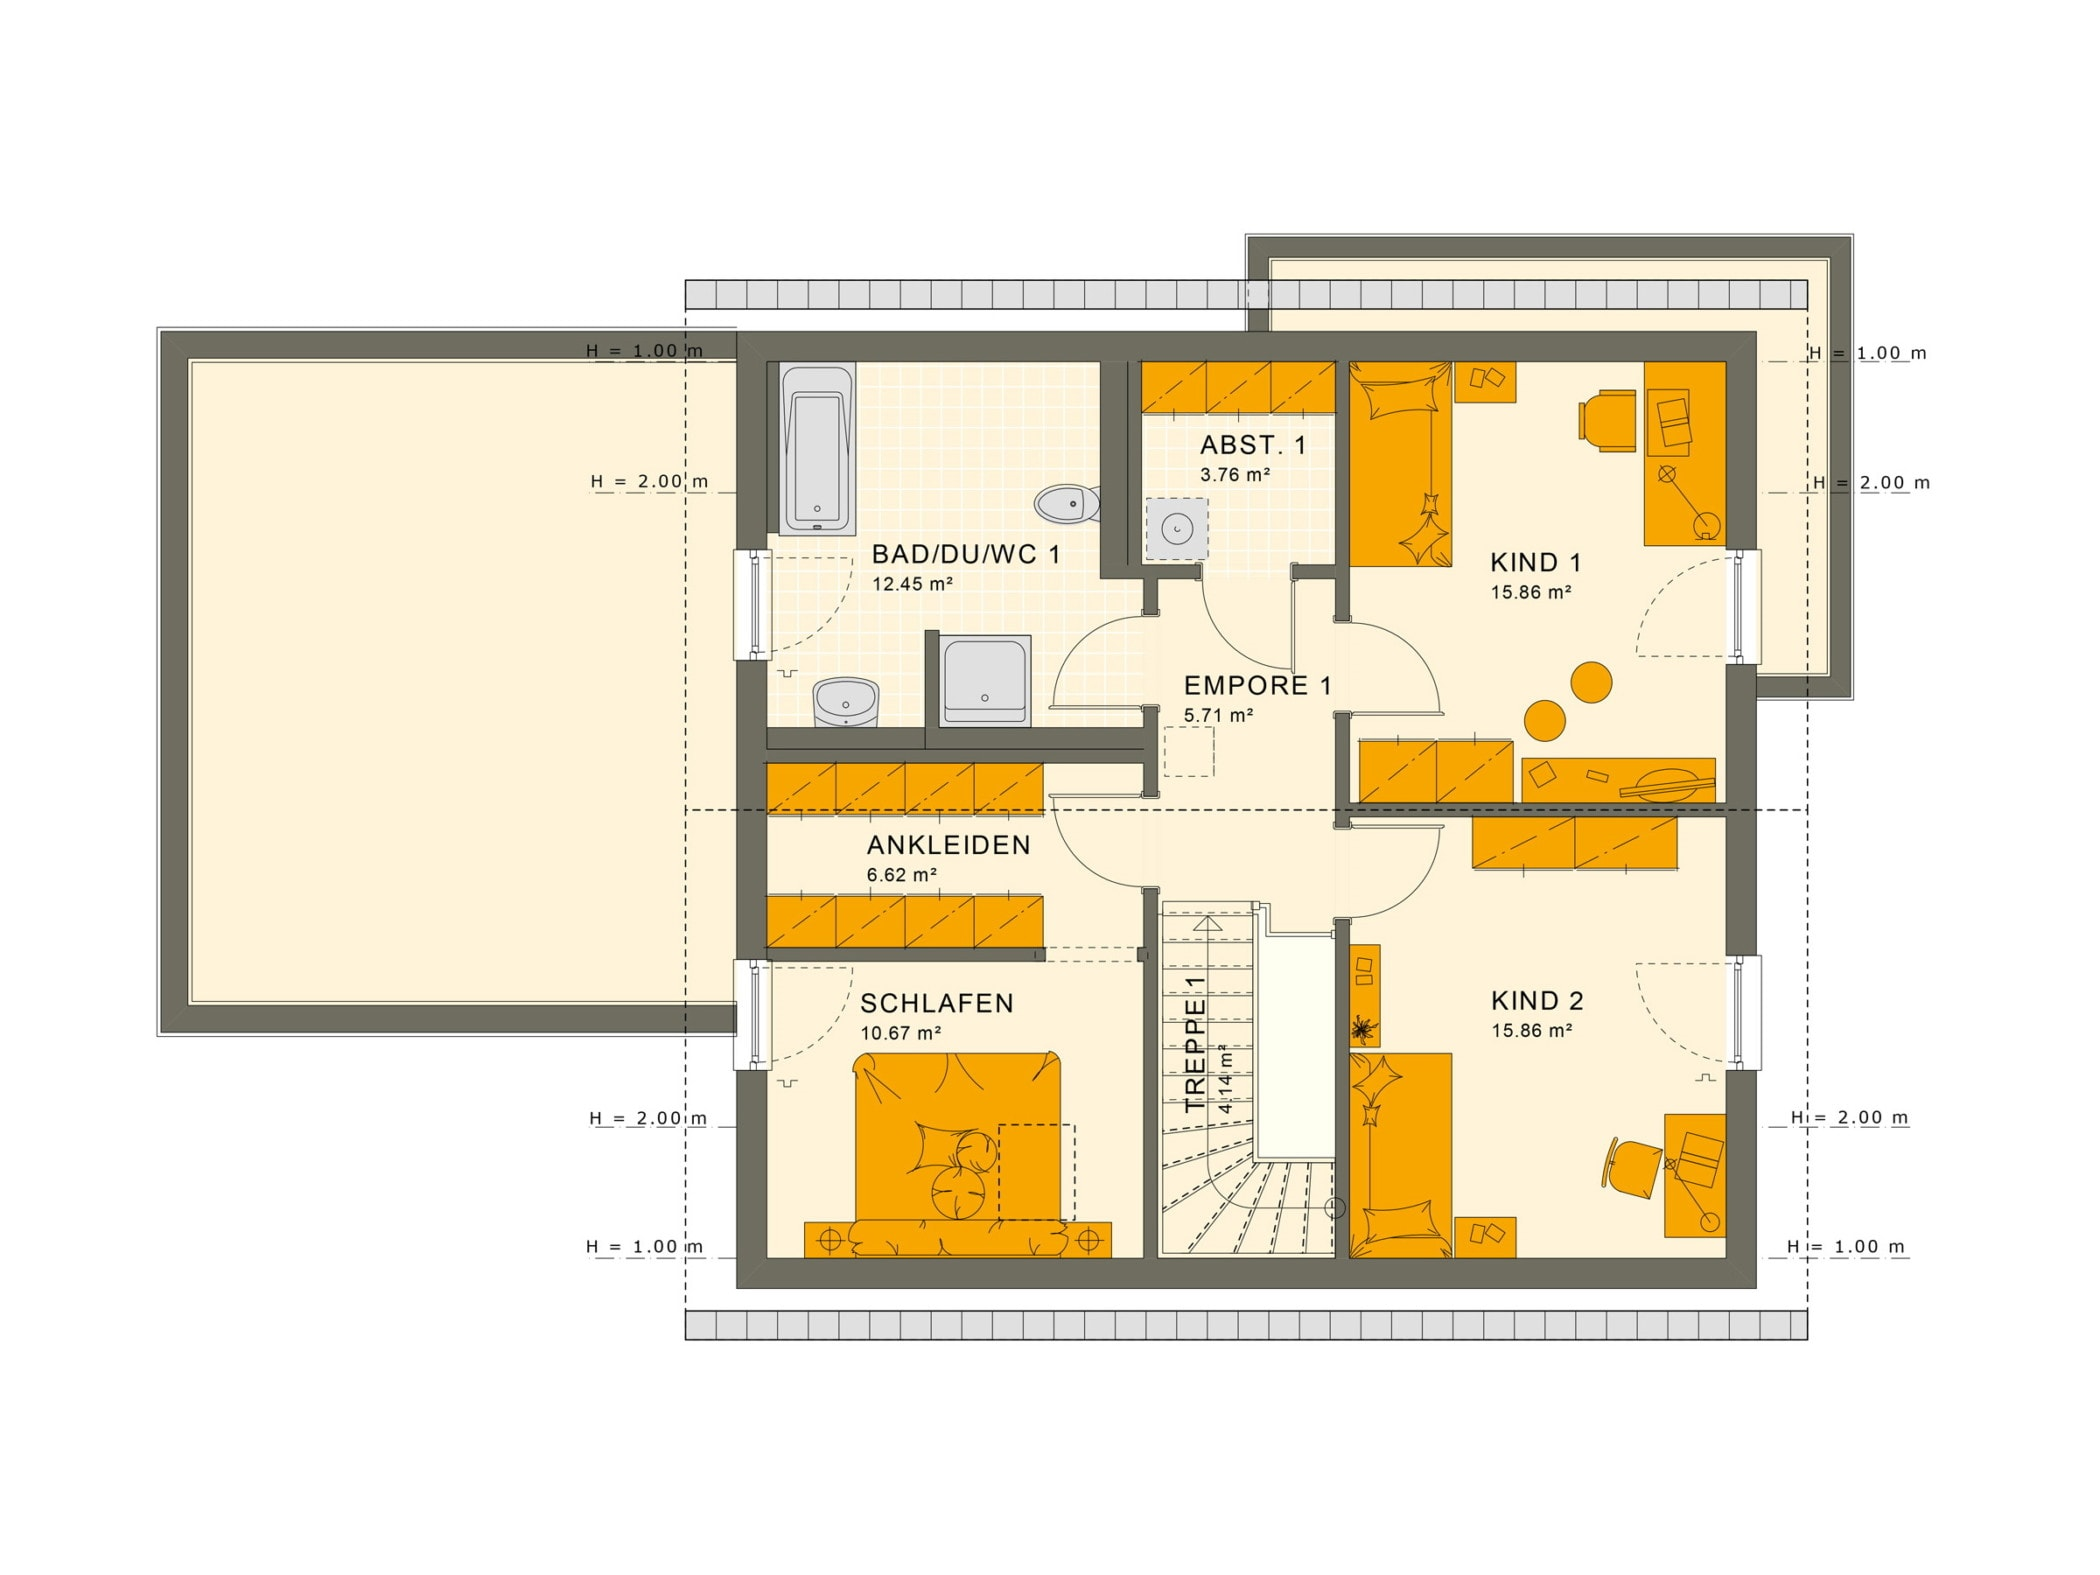 Grundriss Einfamilienhaus mit Einliegerwohnung Obergeschoss, 6 Zimmer, 180 qm - Fertighaus bauen Ideen Living Haus SOLUTION 183 V3 - HausbauDirekt.de